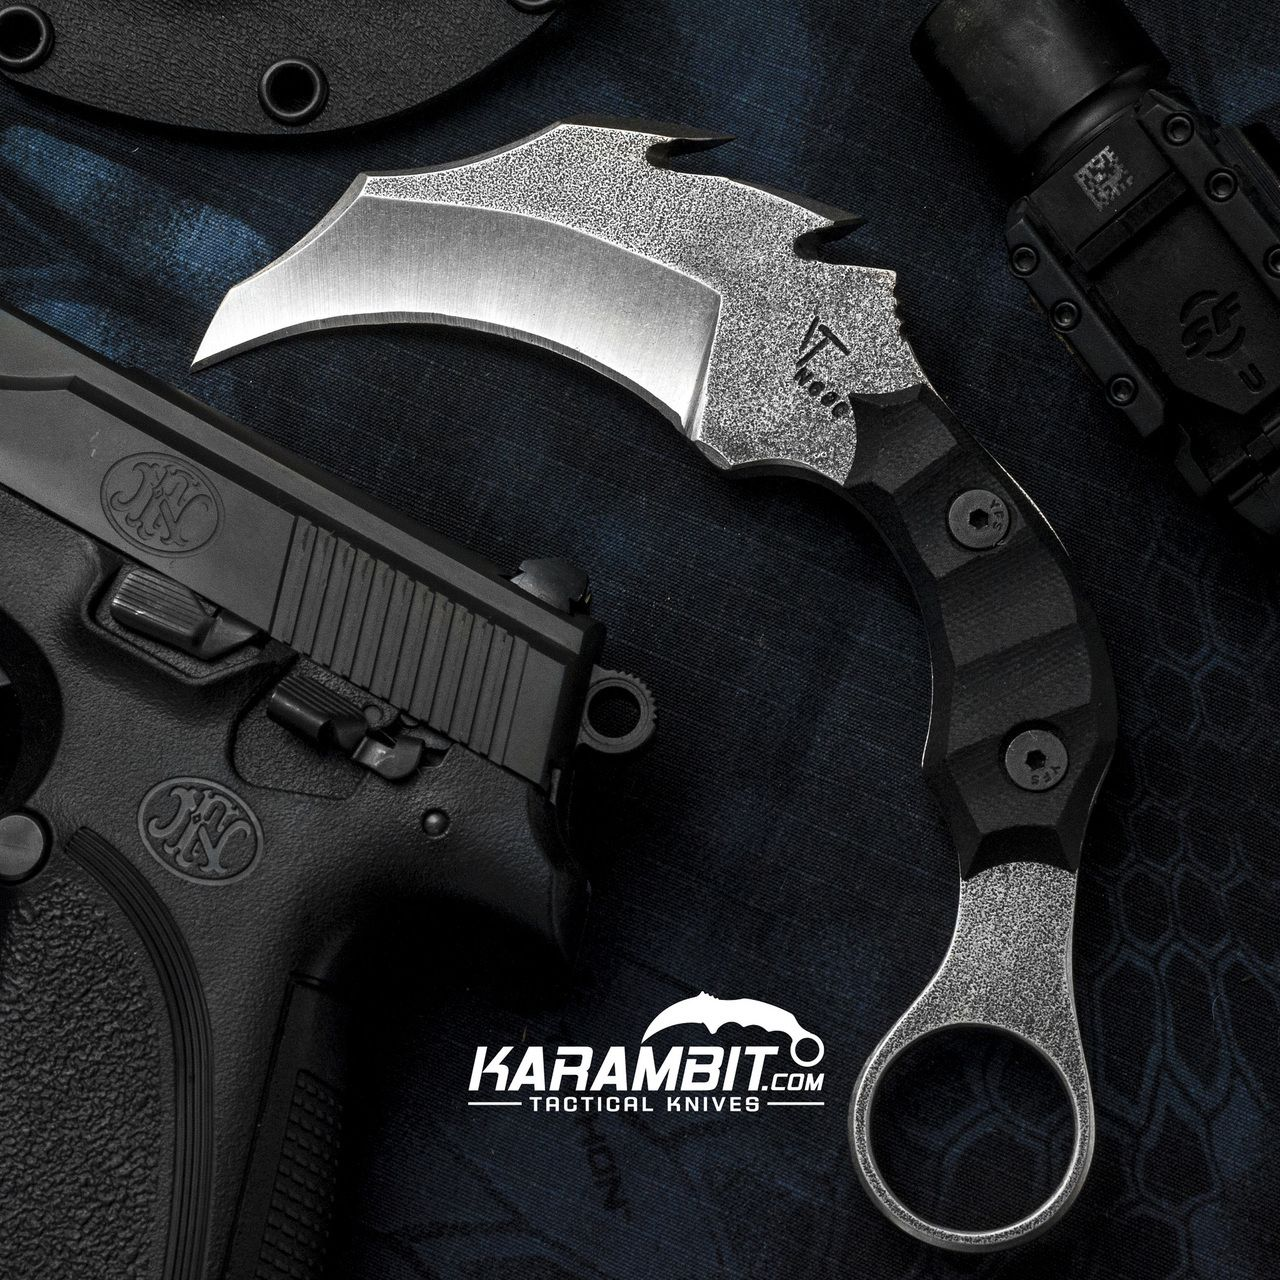 James Coogler's Dragon Karambit - Karambit.com | KNIVES AND SWORDS | Pinterest | Dragon and ...